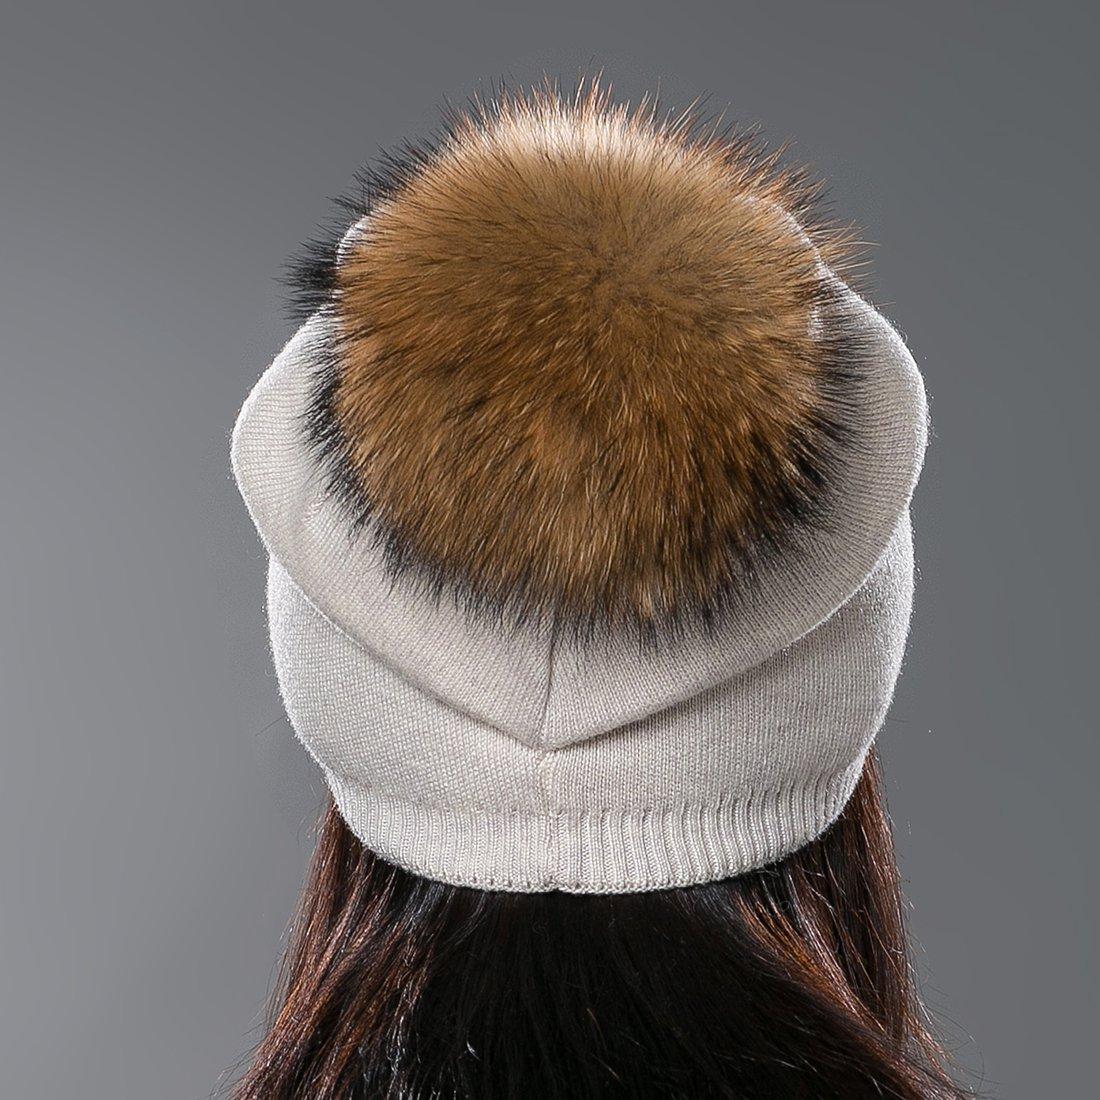 ec0cd834cdfed URSFUR Autumn Unisex Wool Knit Beanie Cap with Fur Ball Pom Pom Winter Hat  at Amazon Women s Clothing store